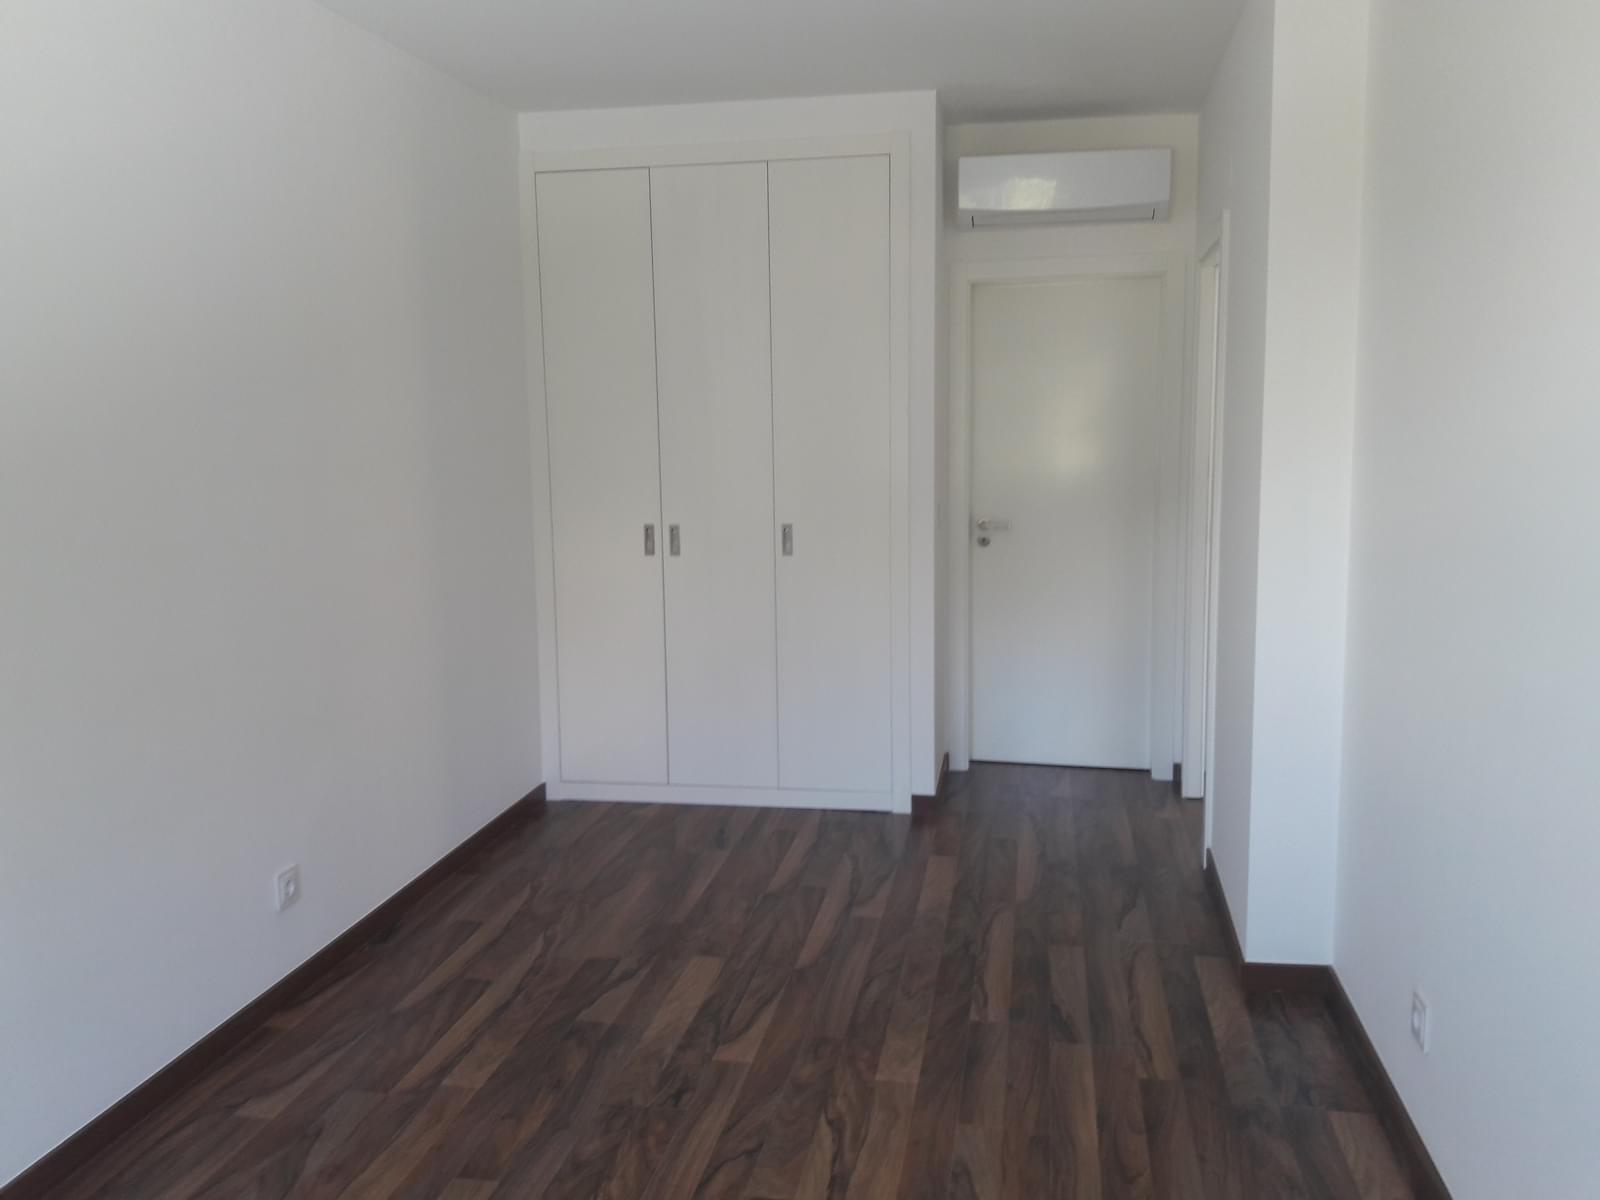 pf18025-apartamento-t3-c2d6db3f-78d2-4e61-a1c0-f2dd22672638